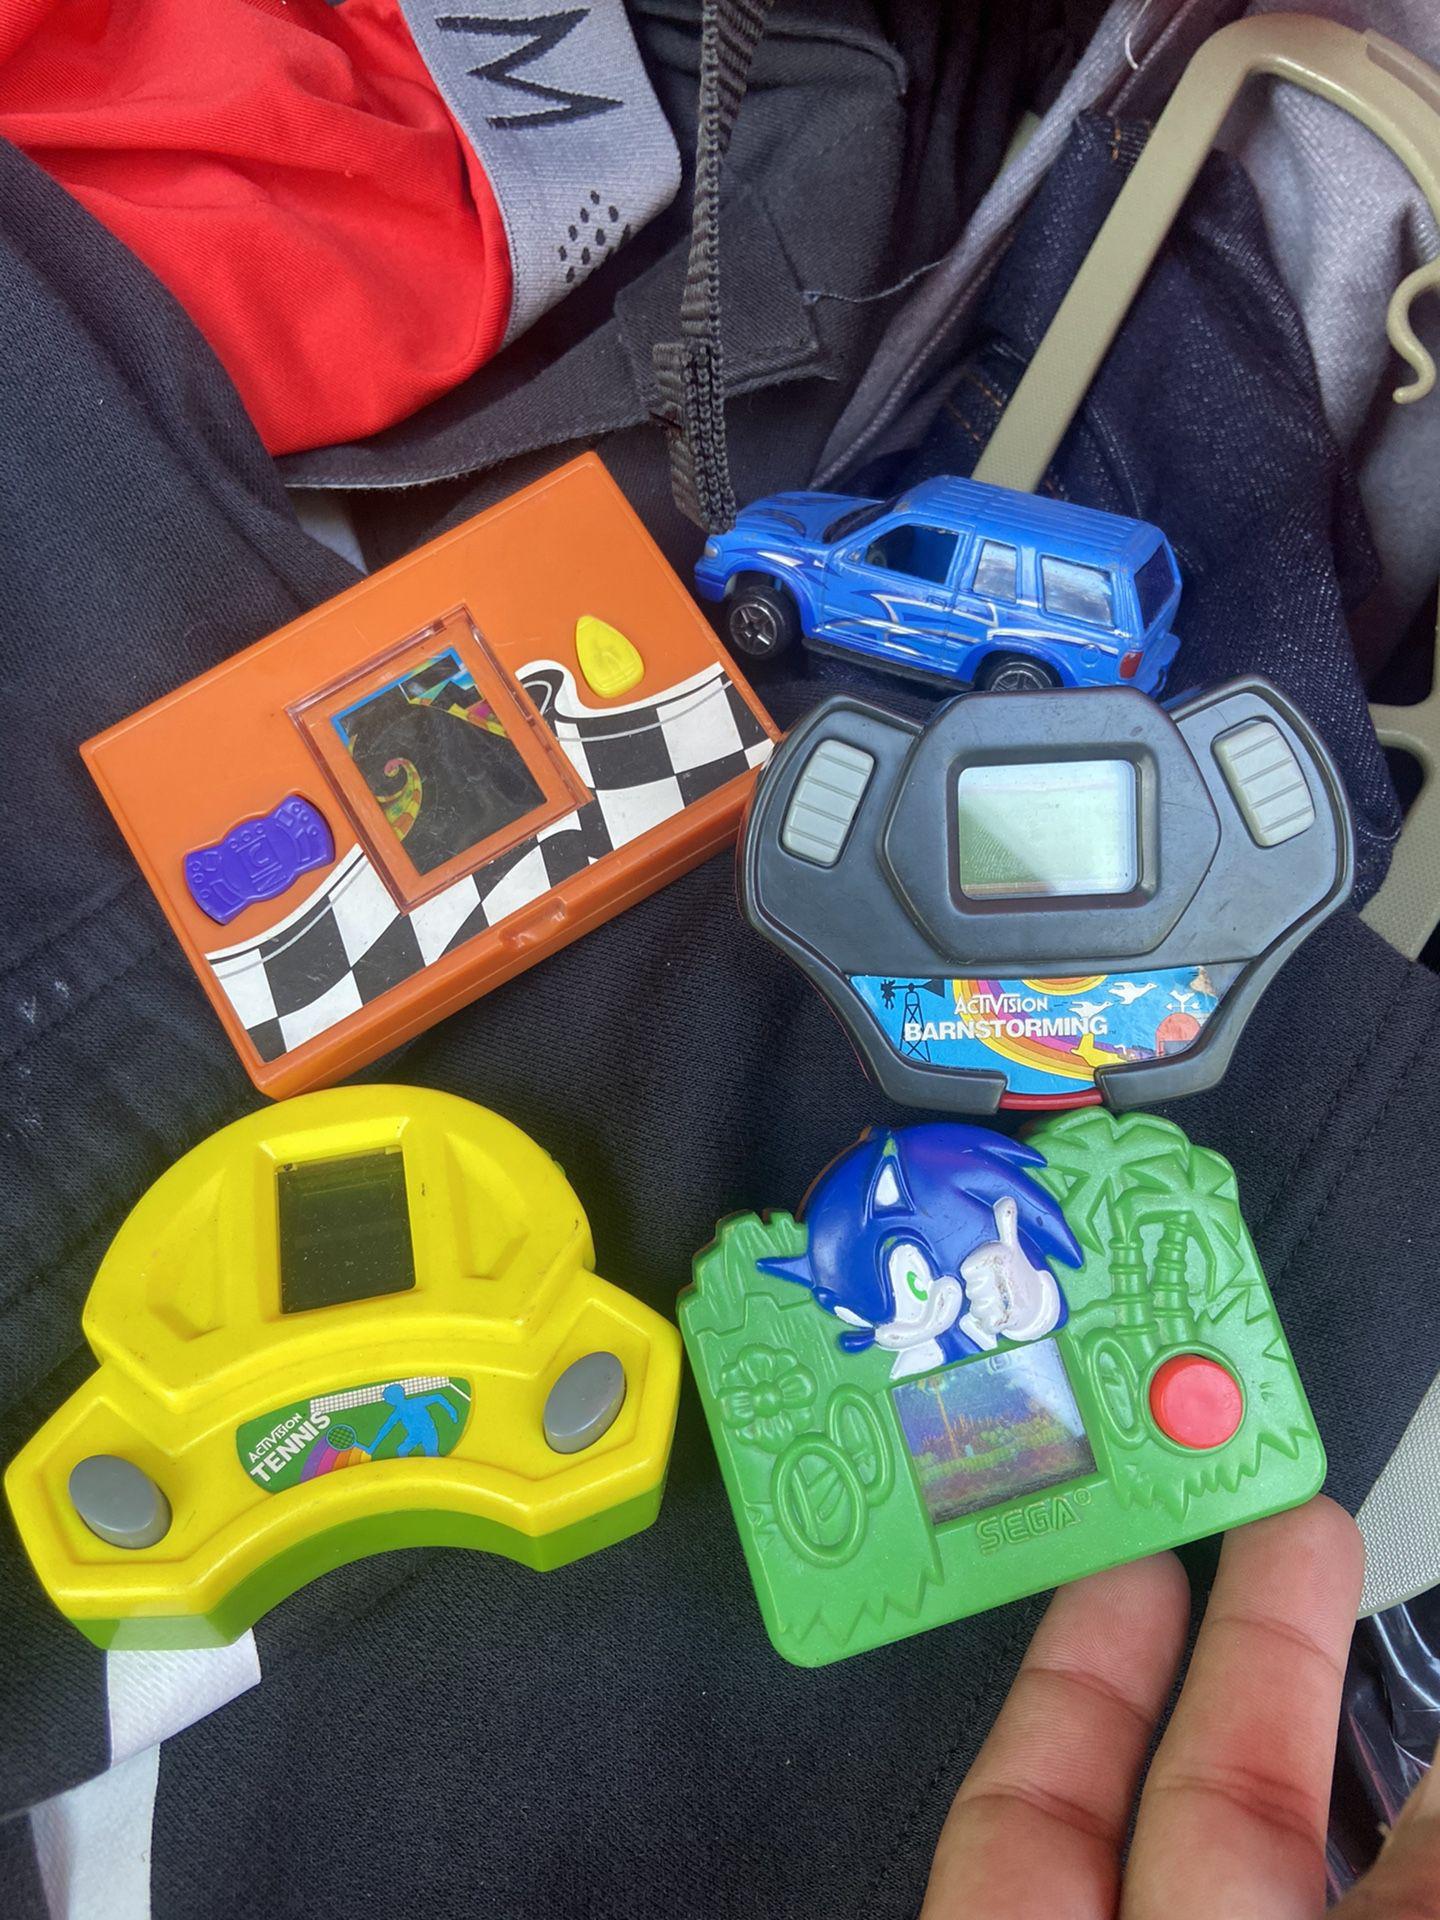 SEGA/ Activision/ Games / Toys